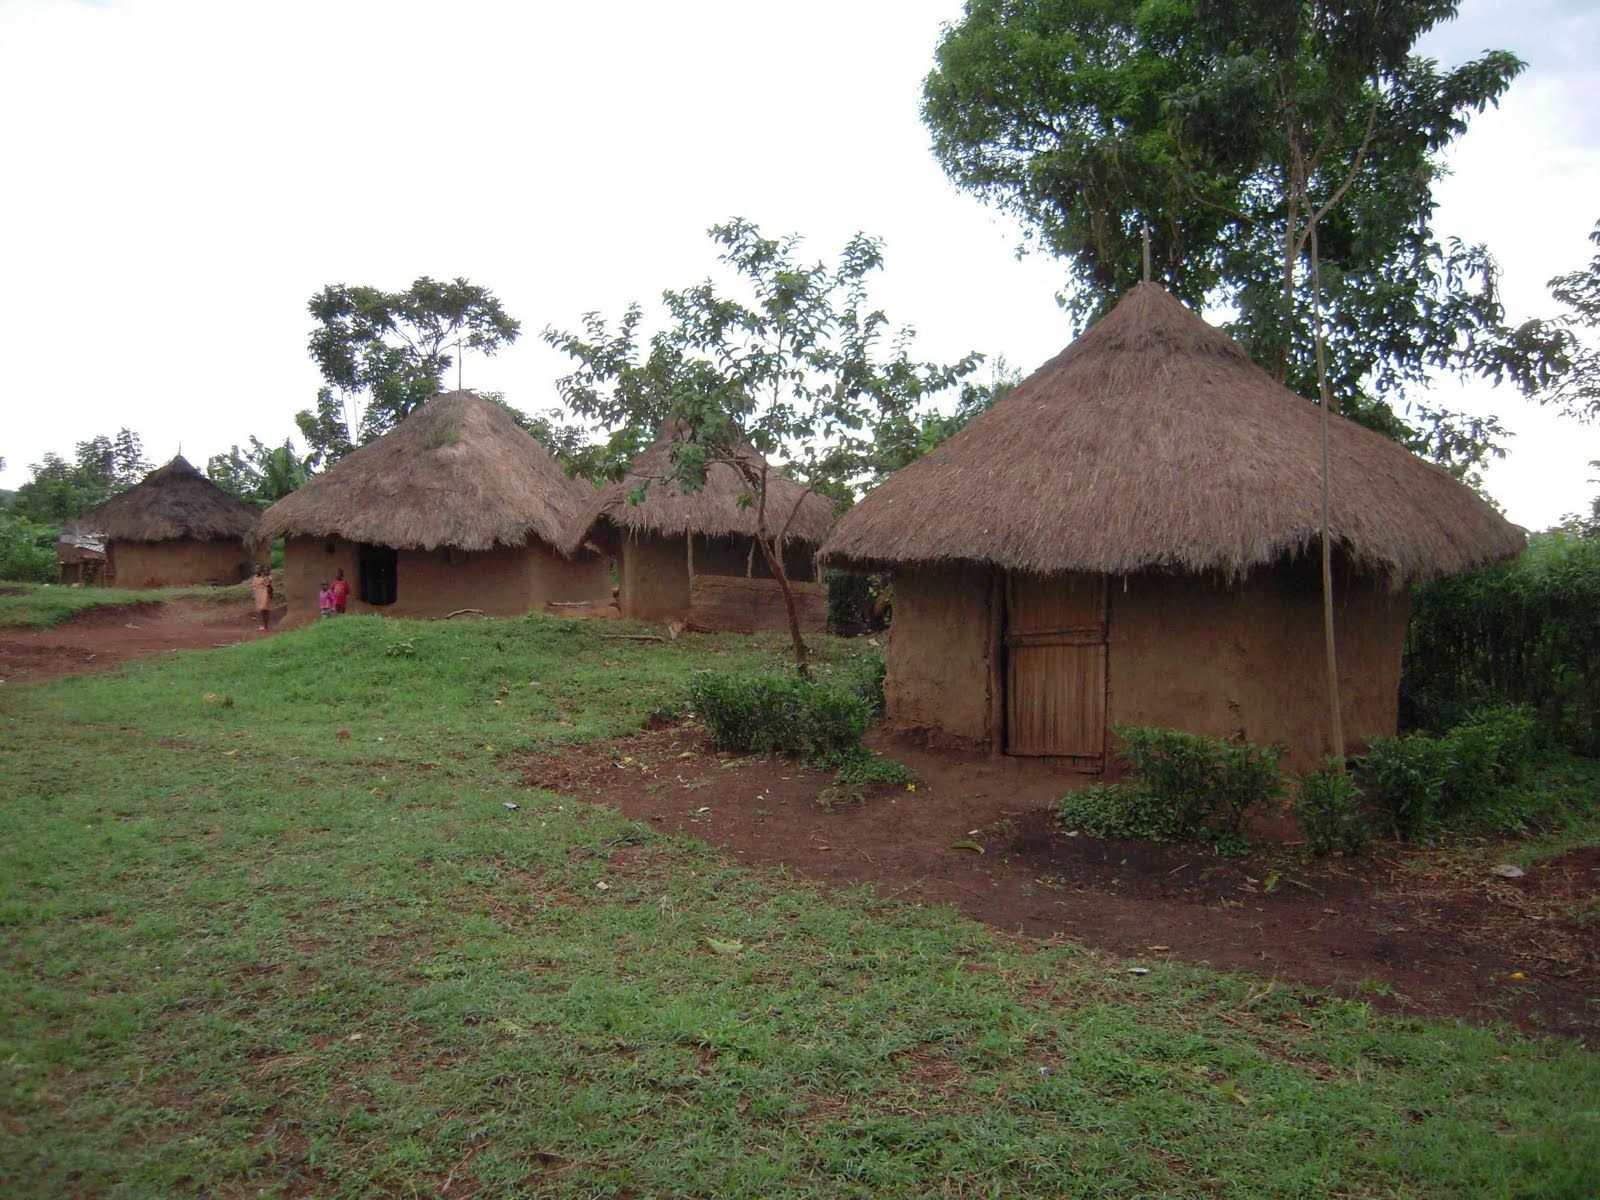 Kenya houses